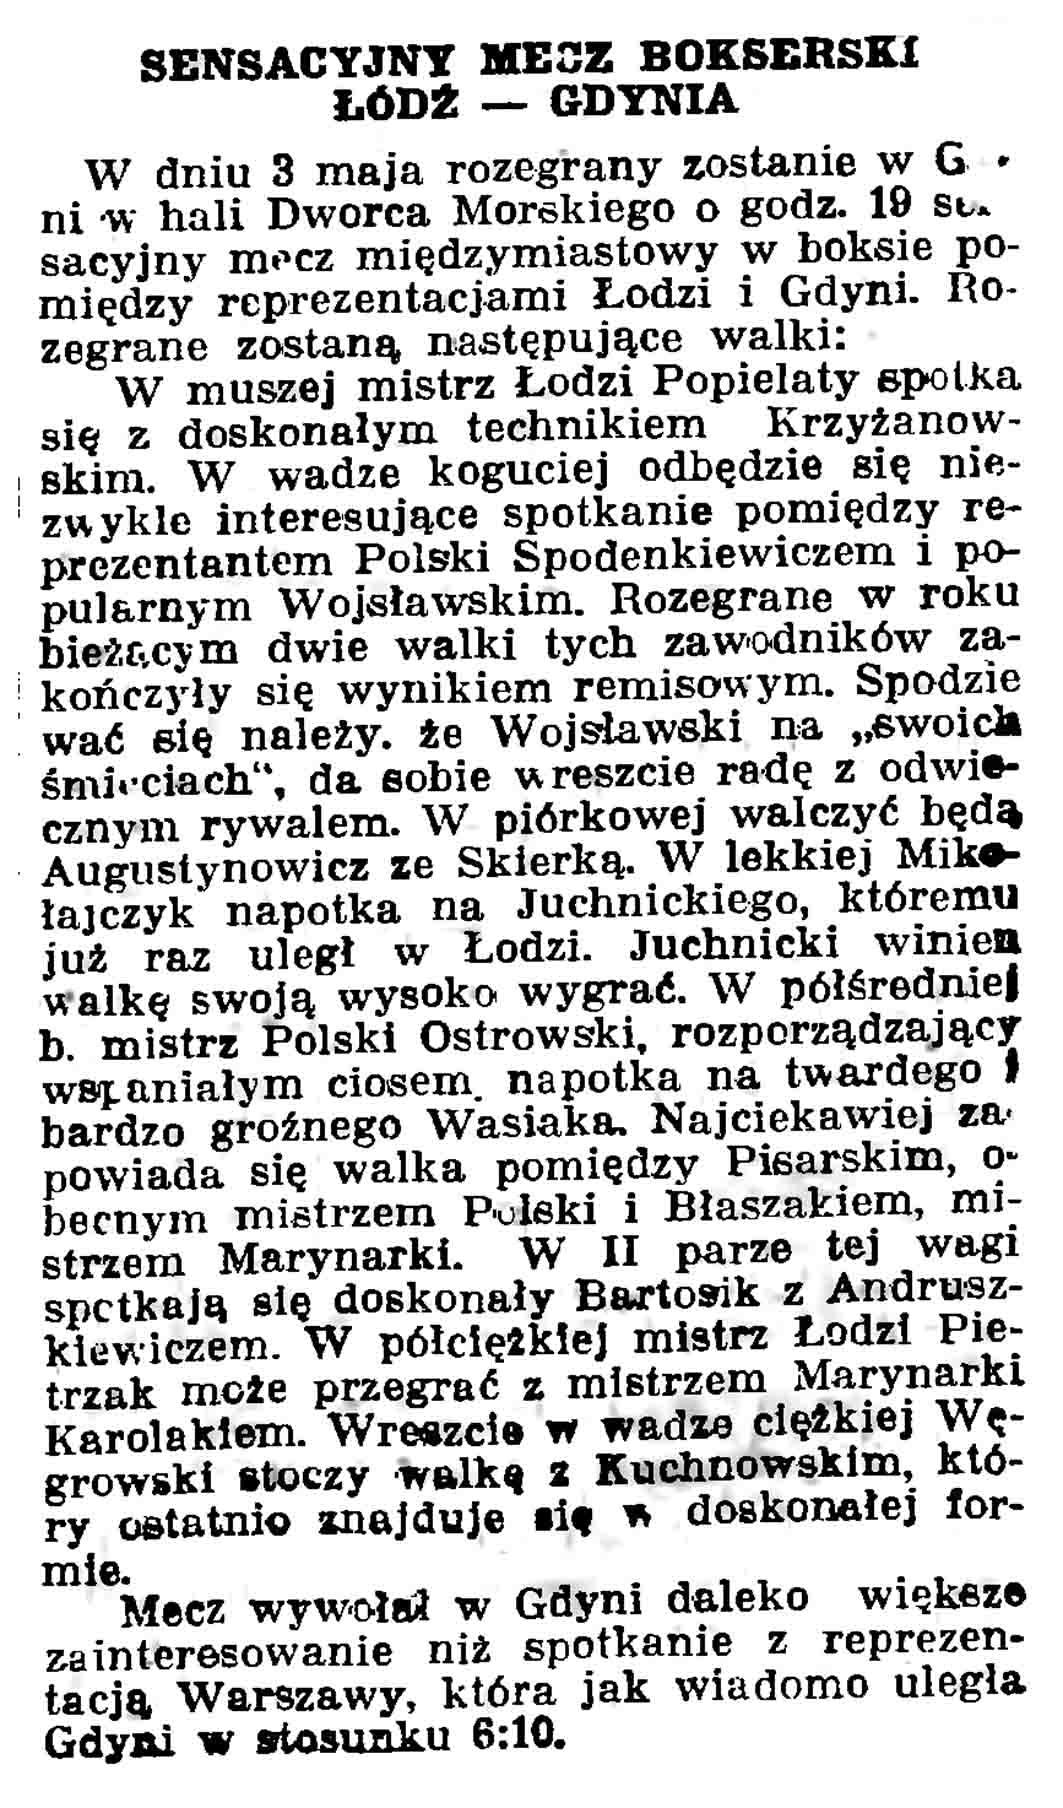 Sensacyjny mecz bokserski Łódź - Gdynia // Gazeta Gdańska. - 1937, nr 100, s. 9